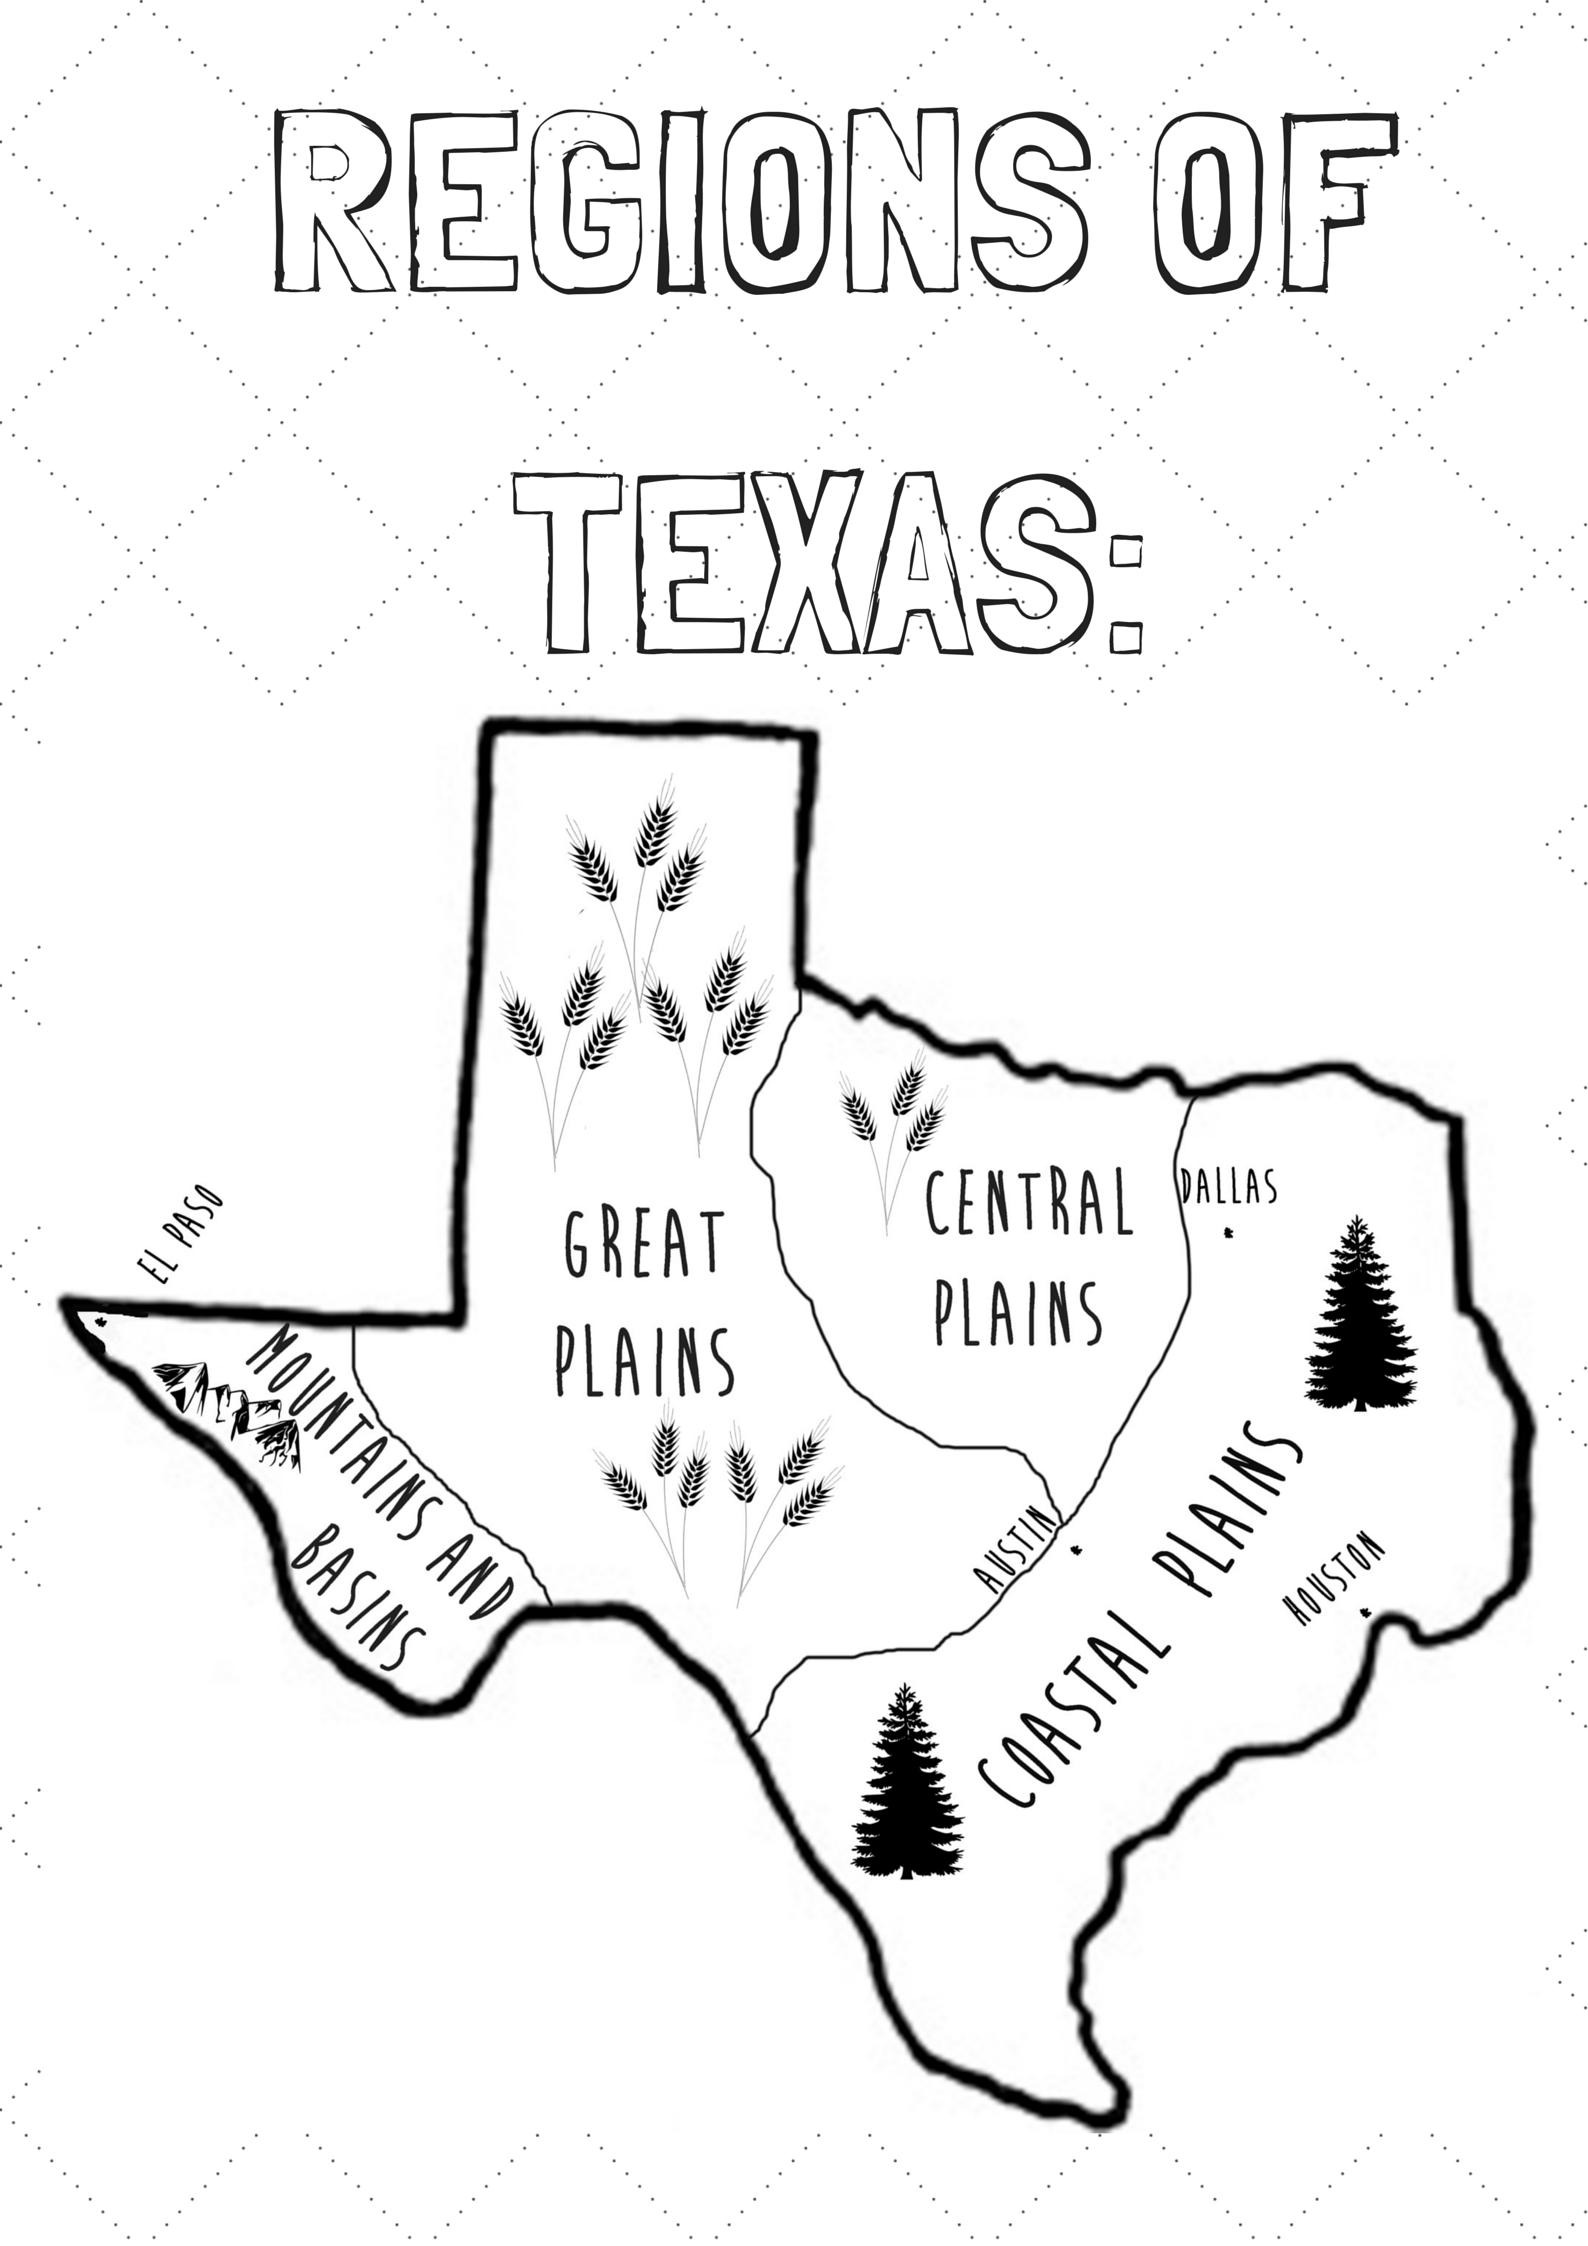 Texas History Regions Poster